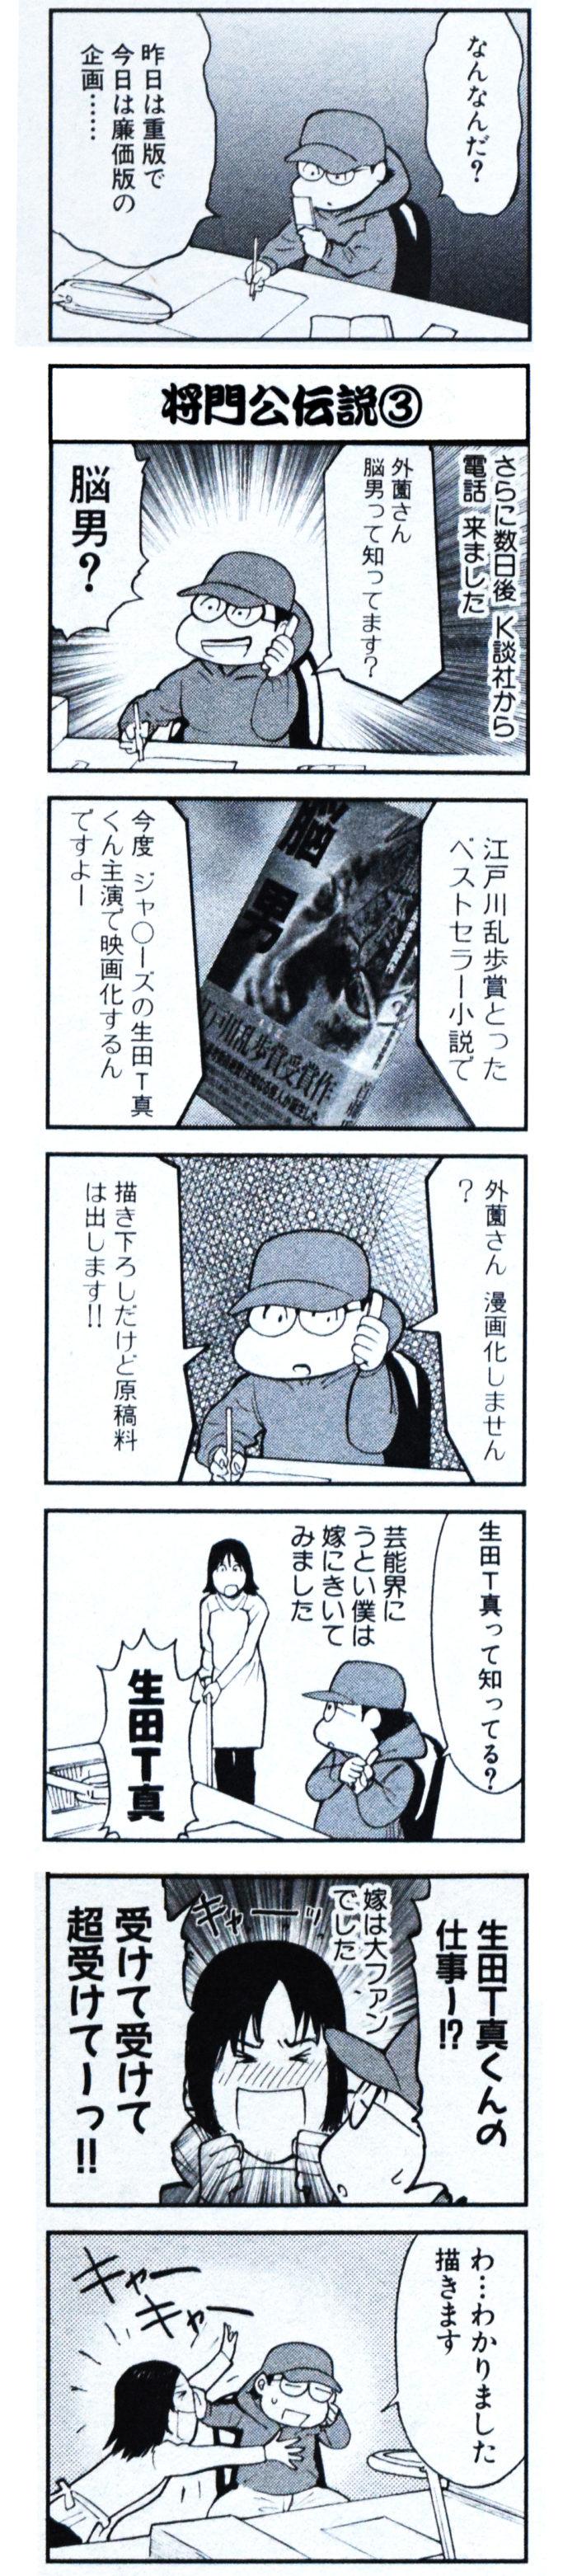 torihada-syoumon03-02